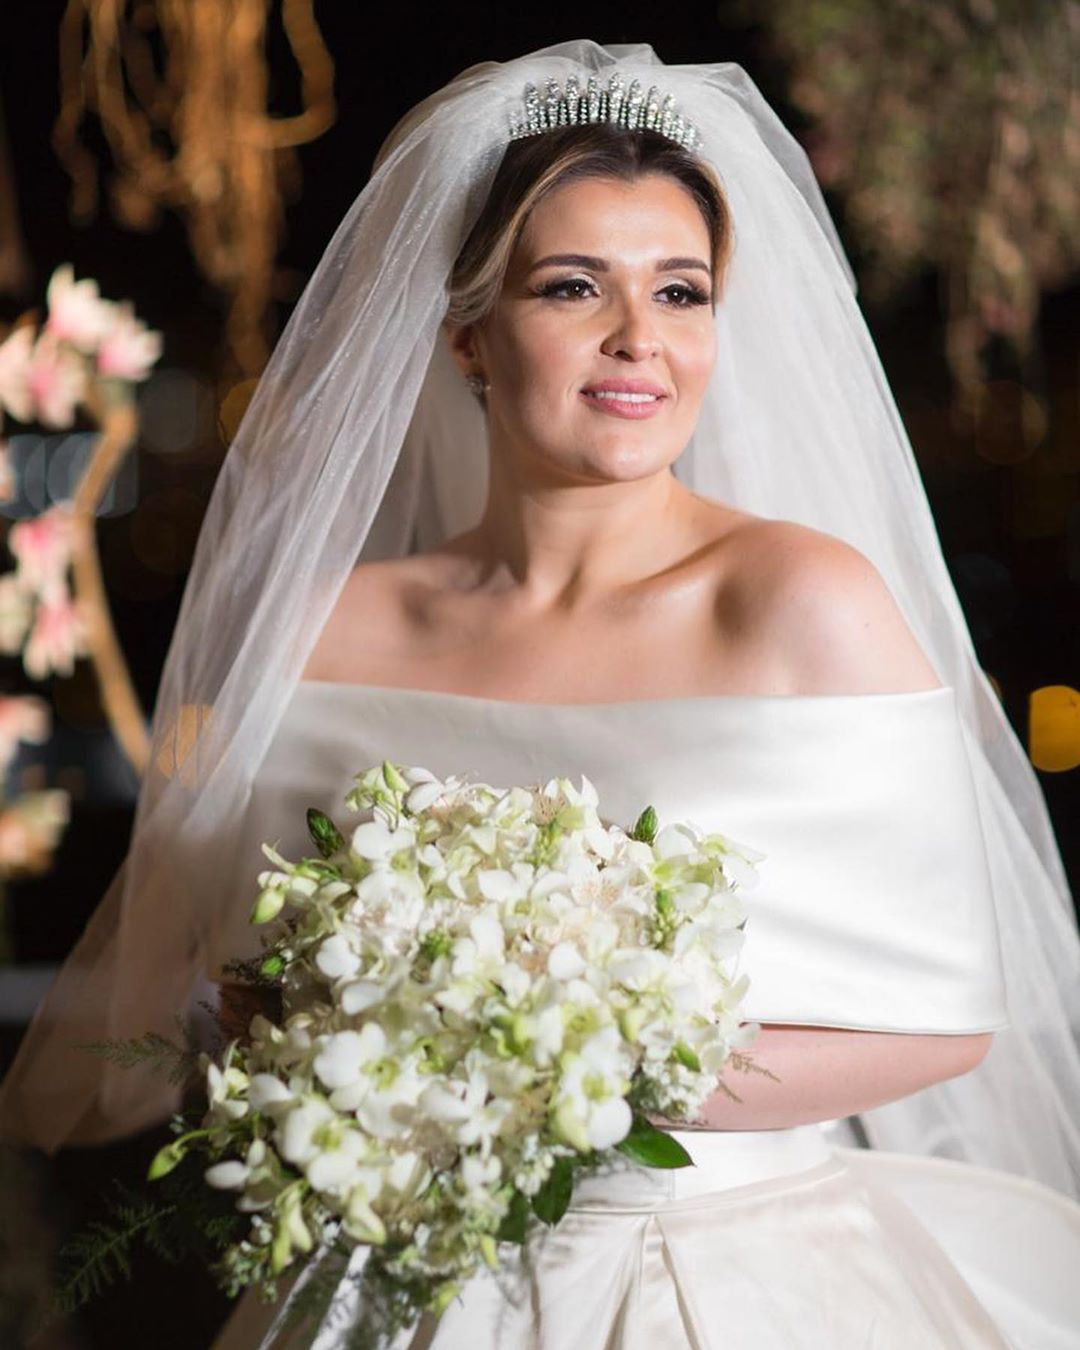 A crossdresser who loves shiny wedding gowns — Paula, Real